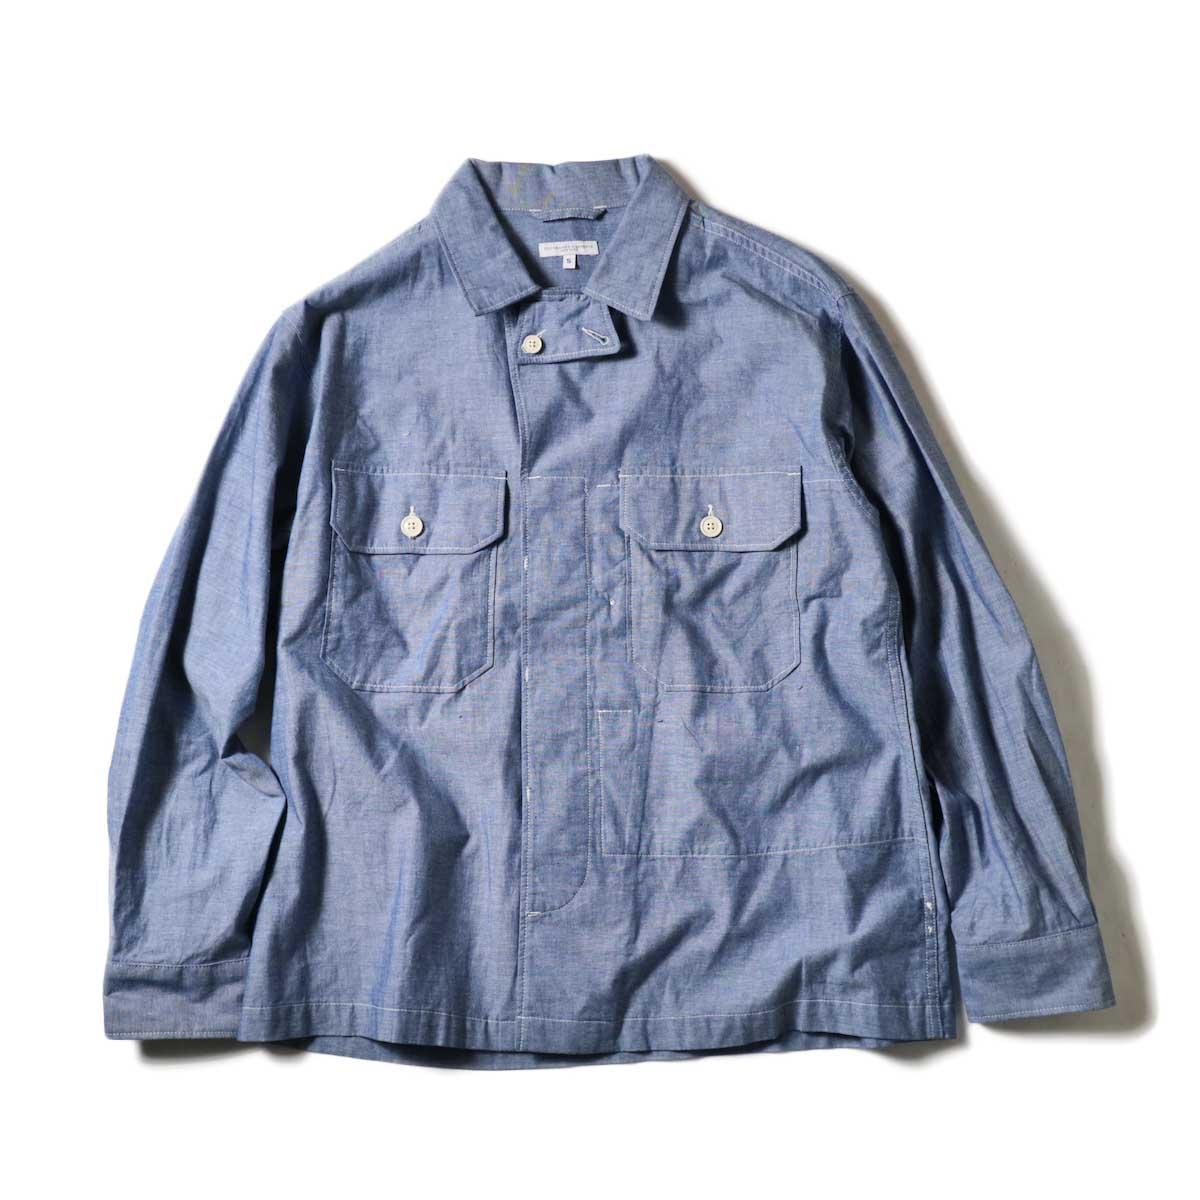 Engineered Garments / MC Shirt Jacket -Cotton Chambray (Blue)正面